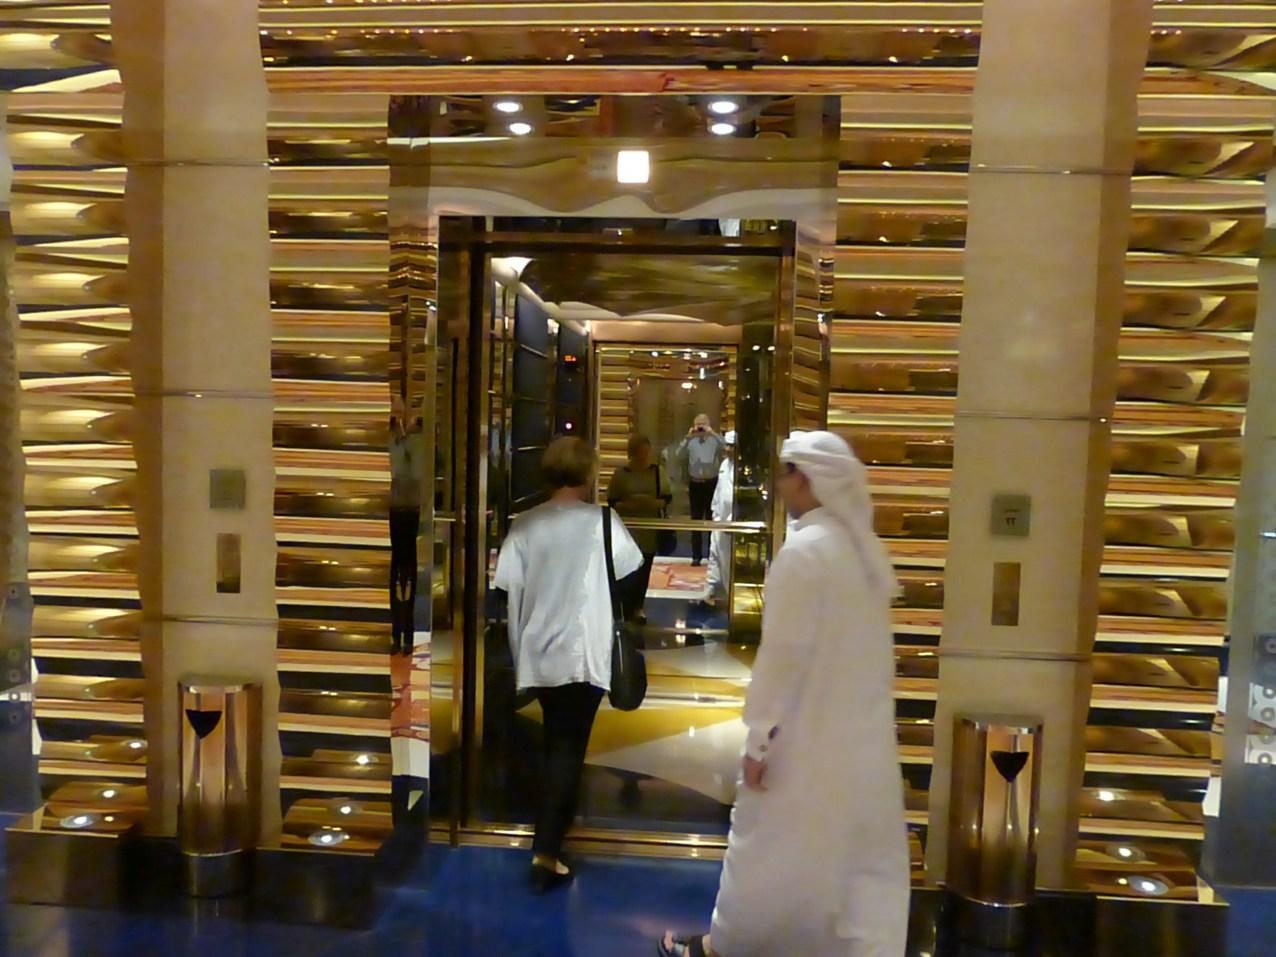 Deb going into elevator up to top floor